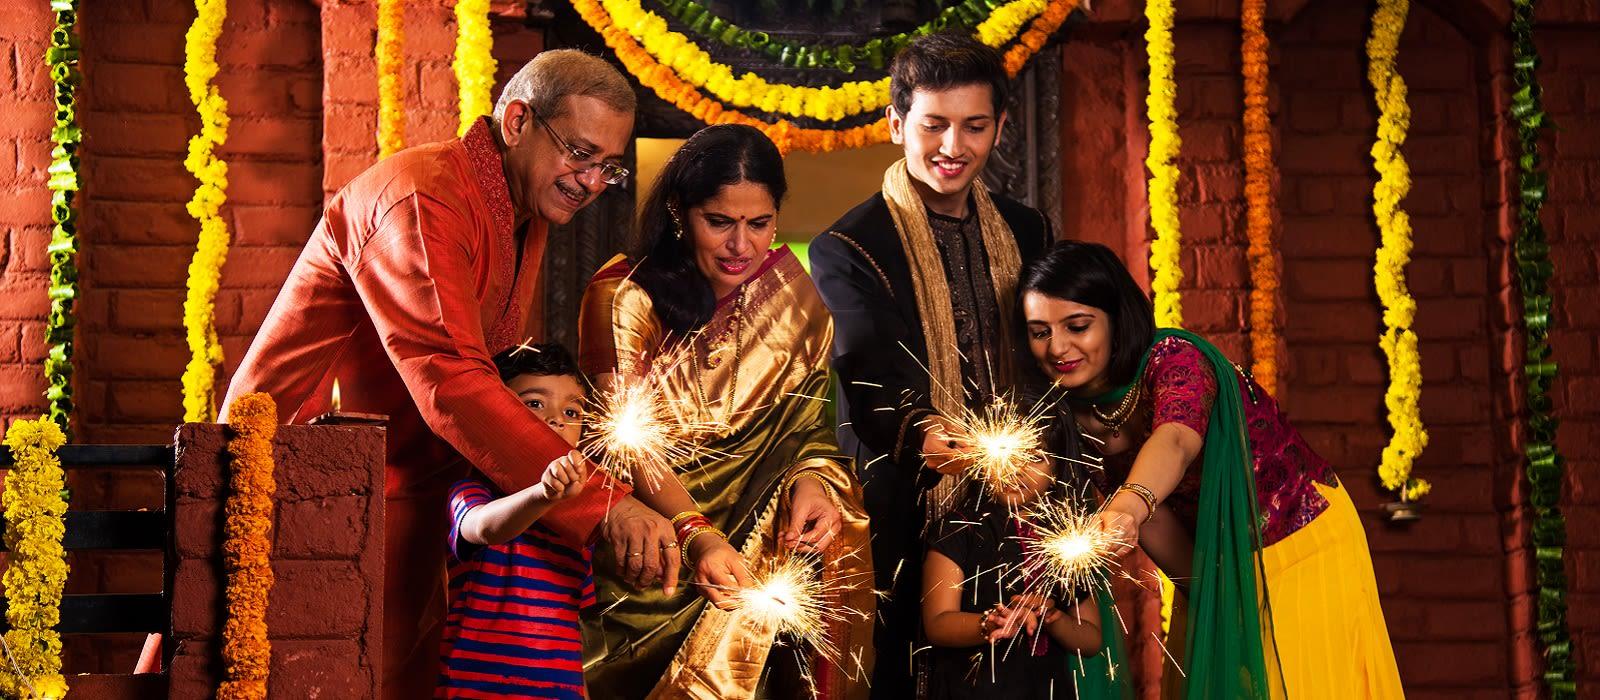 Festival Fieber: Diwali in Indien Urlaub 4